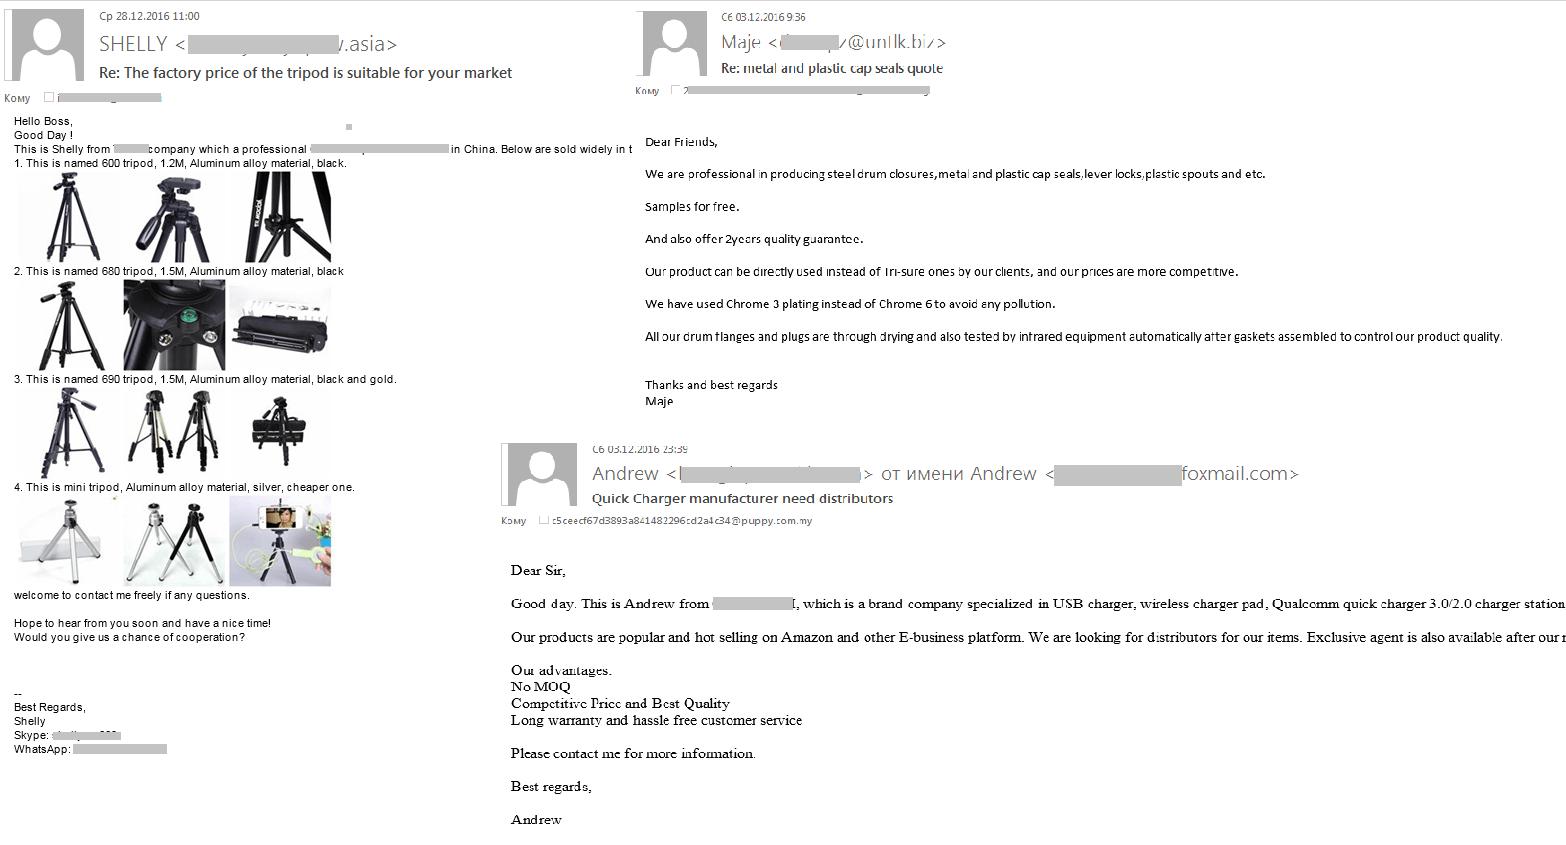 Groß Monster Indien Probe Fortsetzen Fotos - Entry Level Resume ...